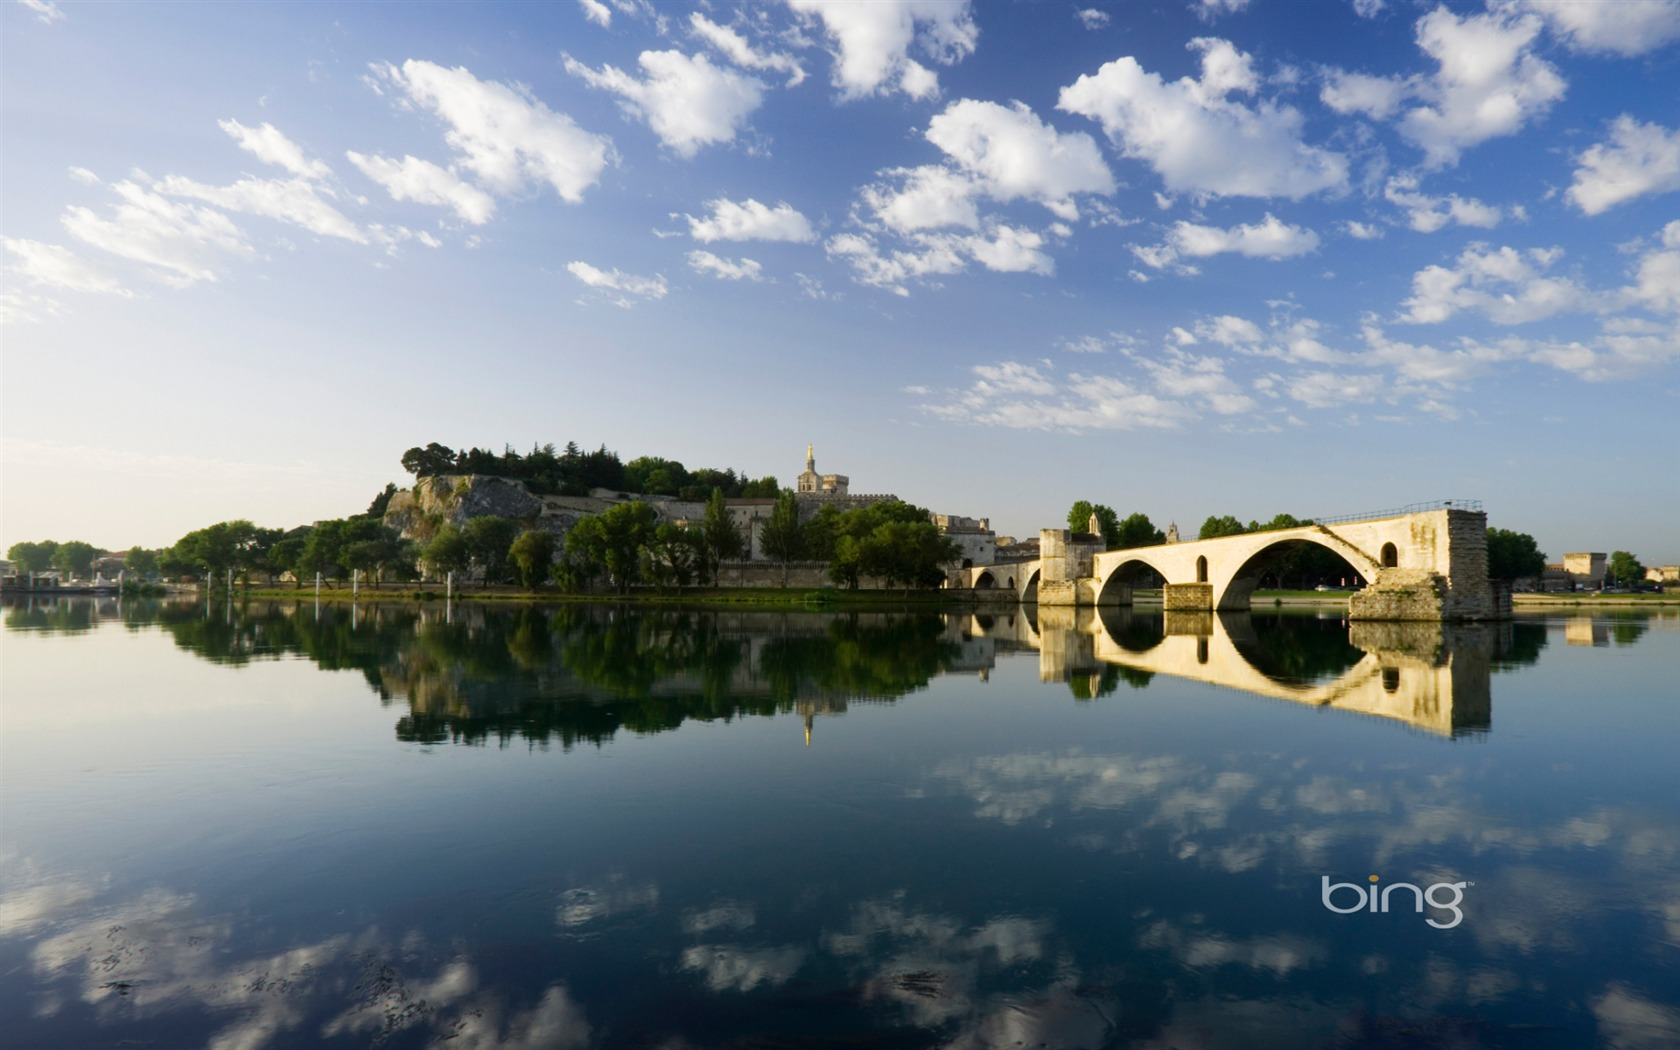 Bing   HD Wallpaper Pictures Pics Photos Images Desktop 1680x1050